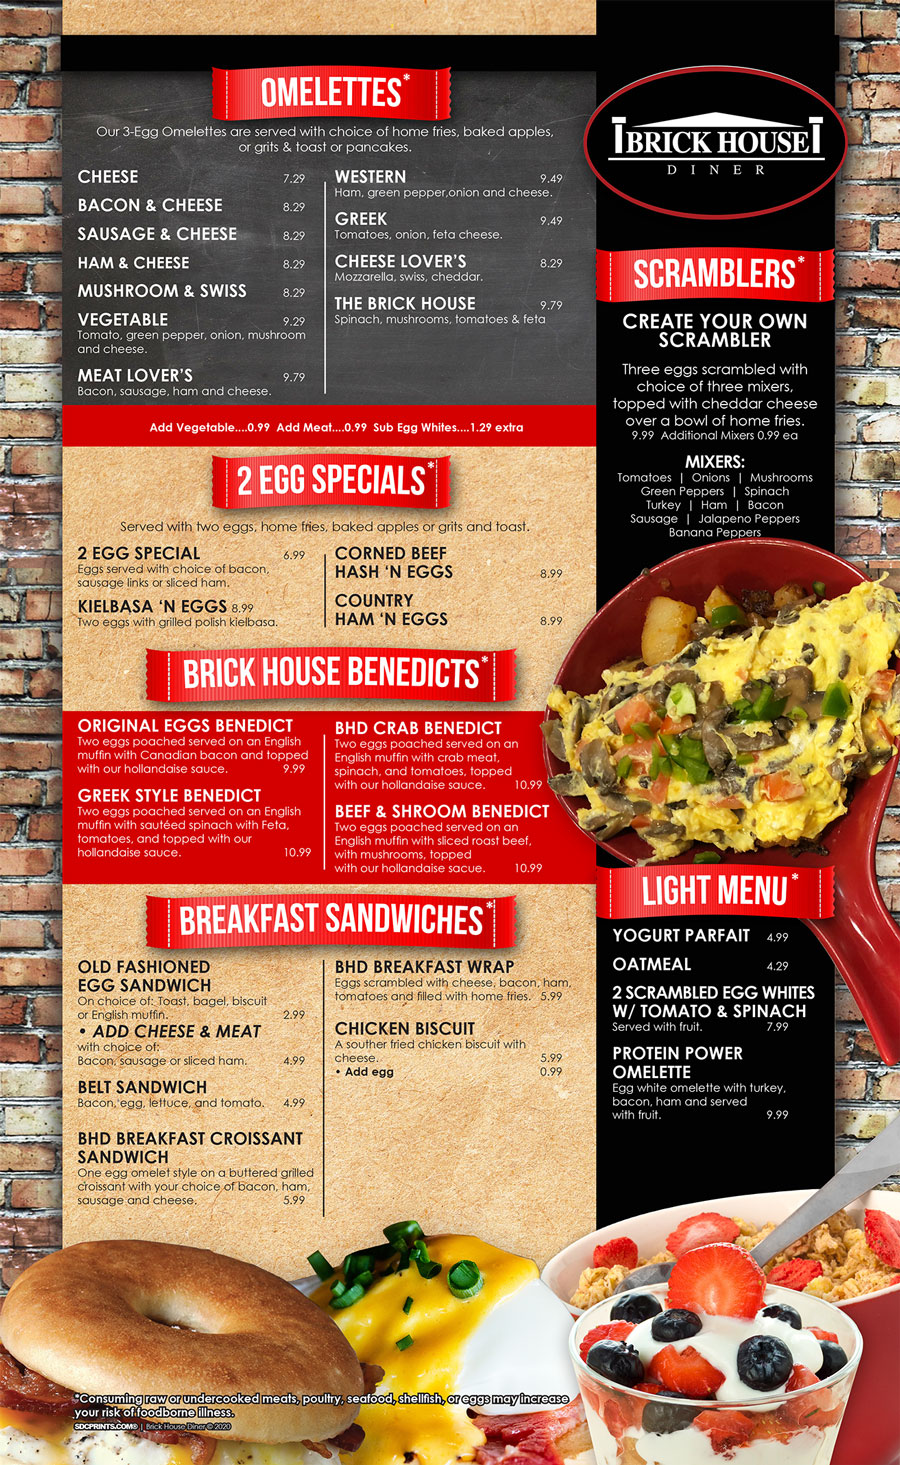 Brick-House-Diner-VB-Breakfast-web-1